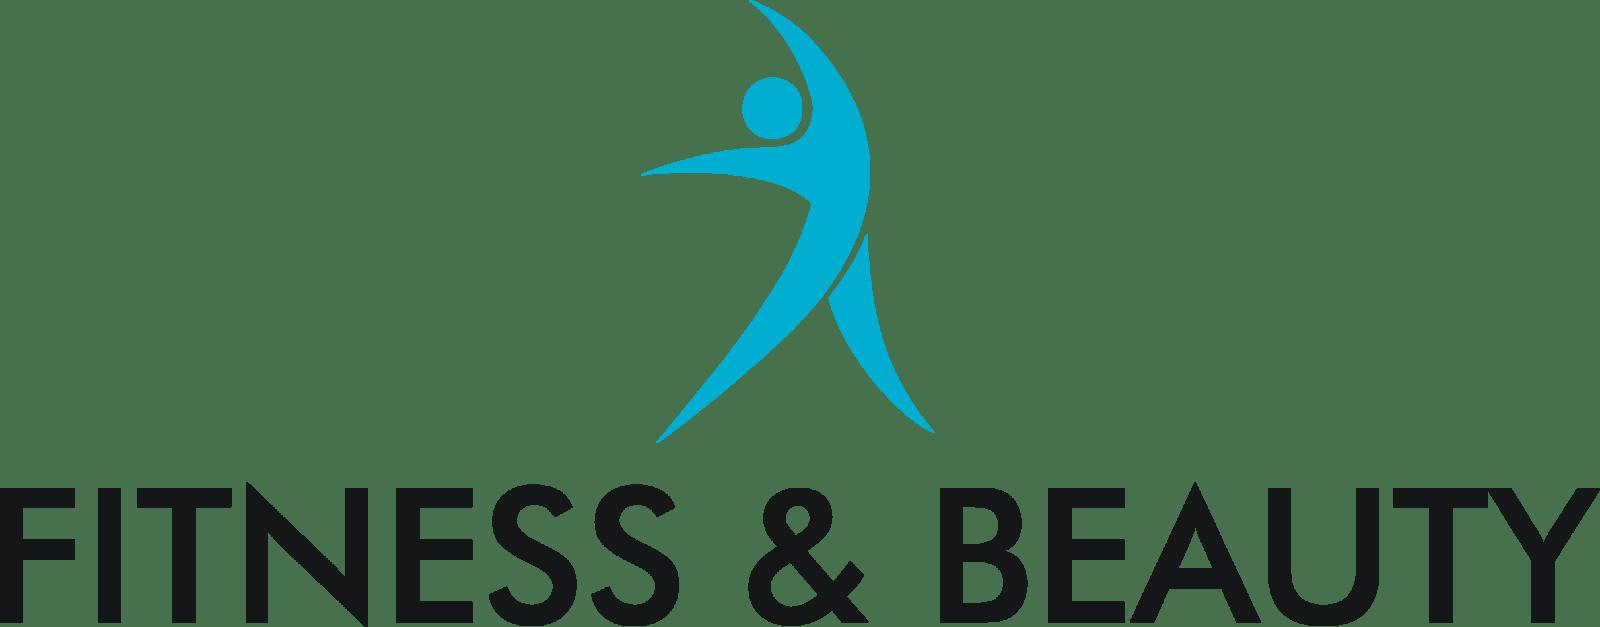 Fitness&Beauty